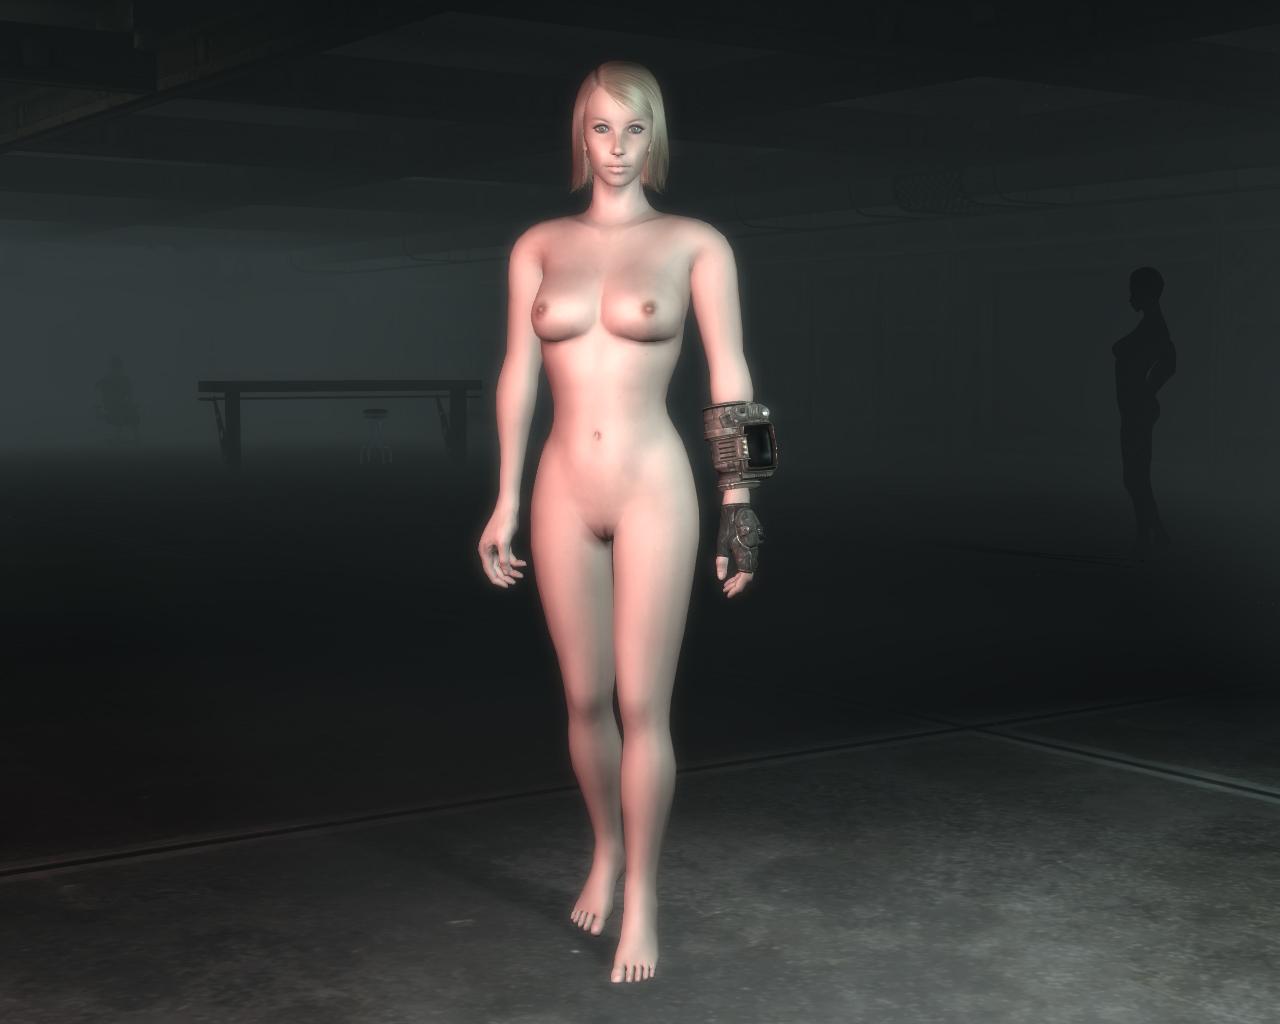 Gallerysexpic nude fetish women